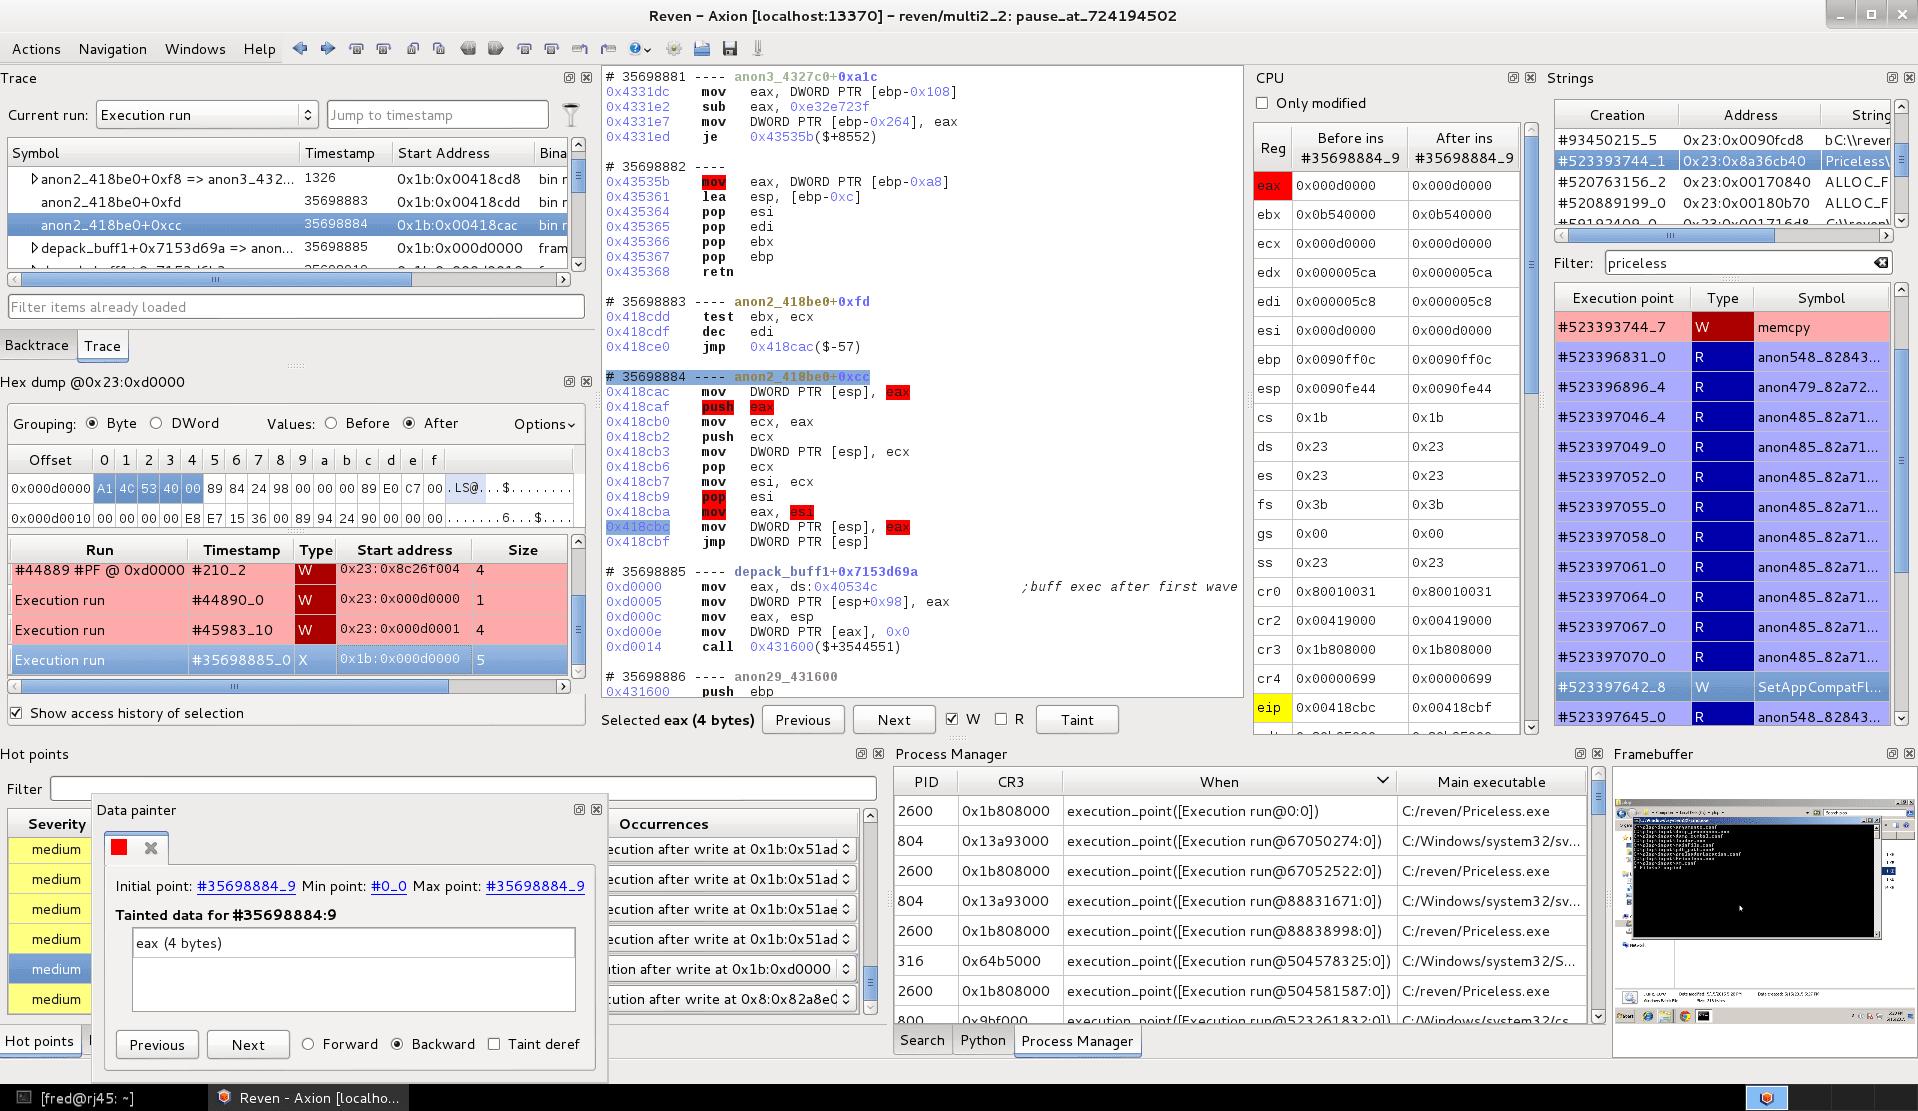 REVEN-Axion screenshot